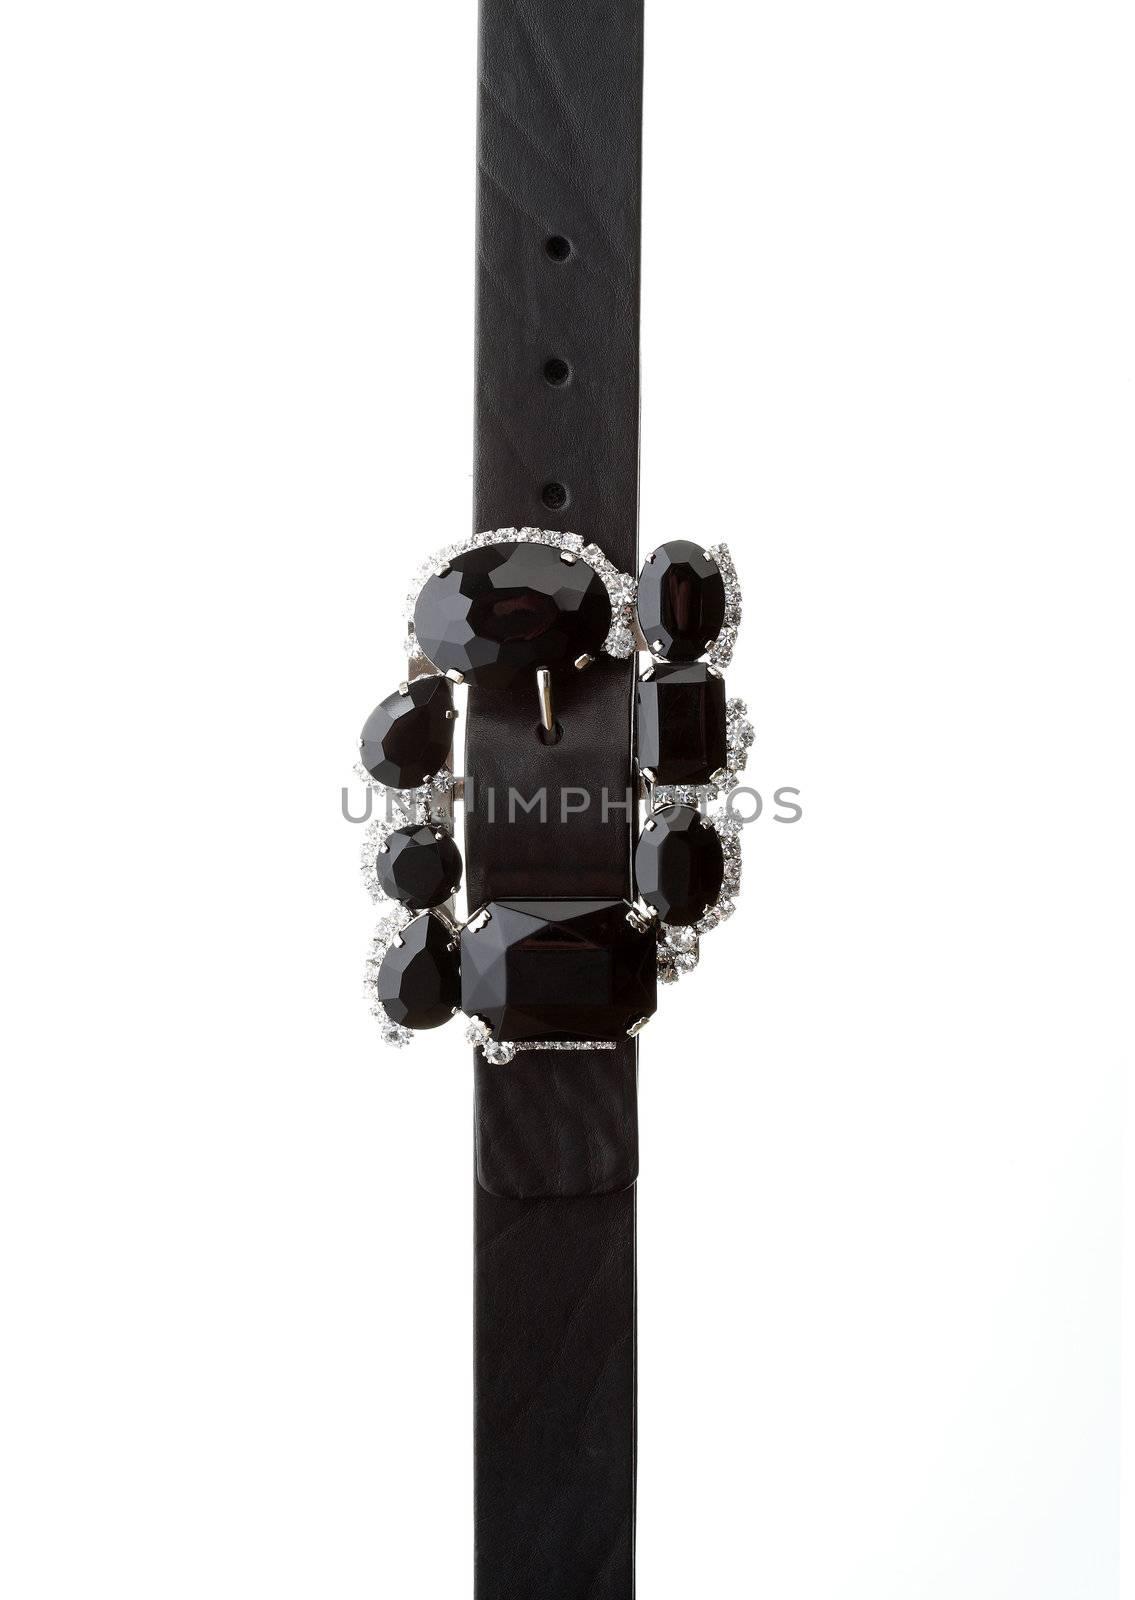 Close-up of studded modern fashionable belt